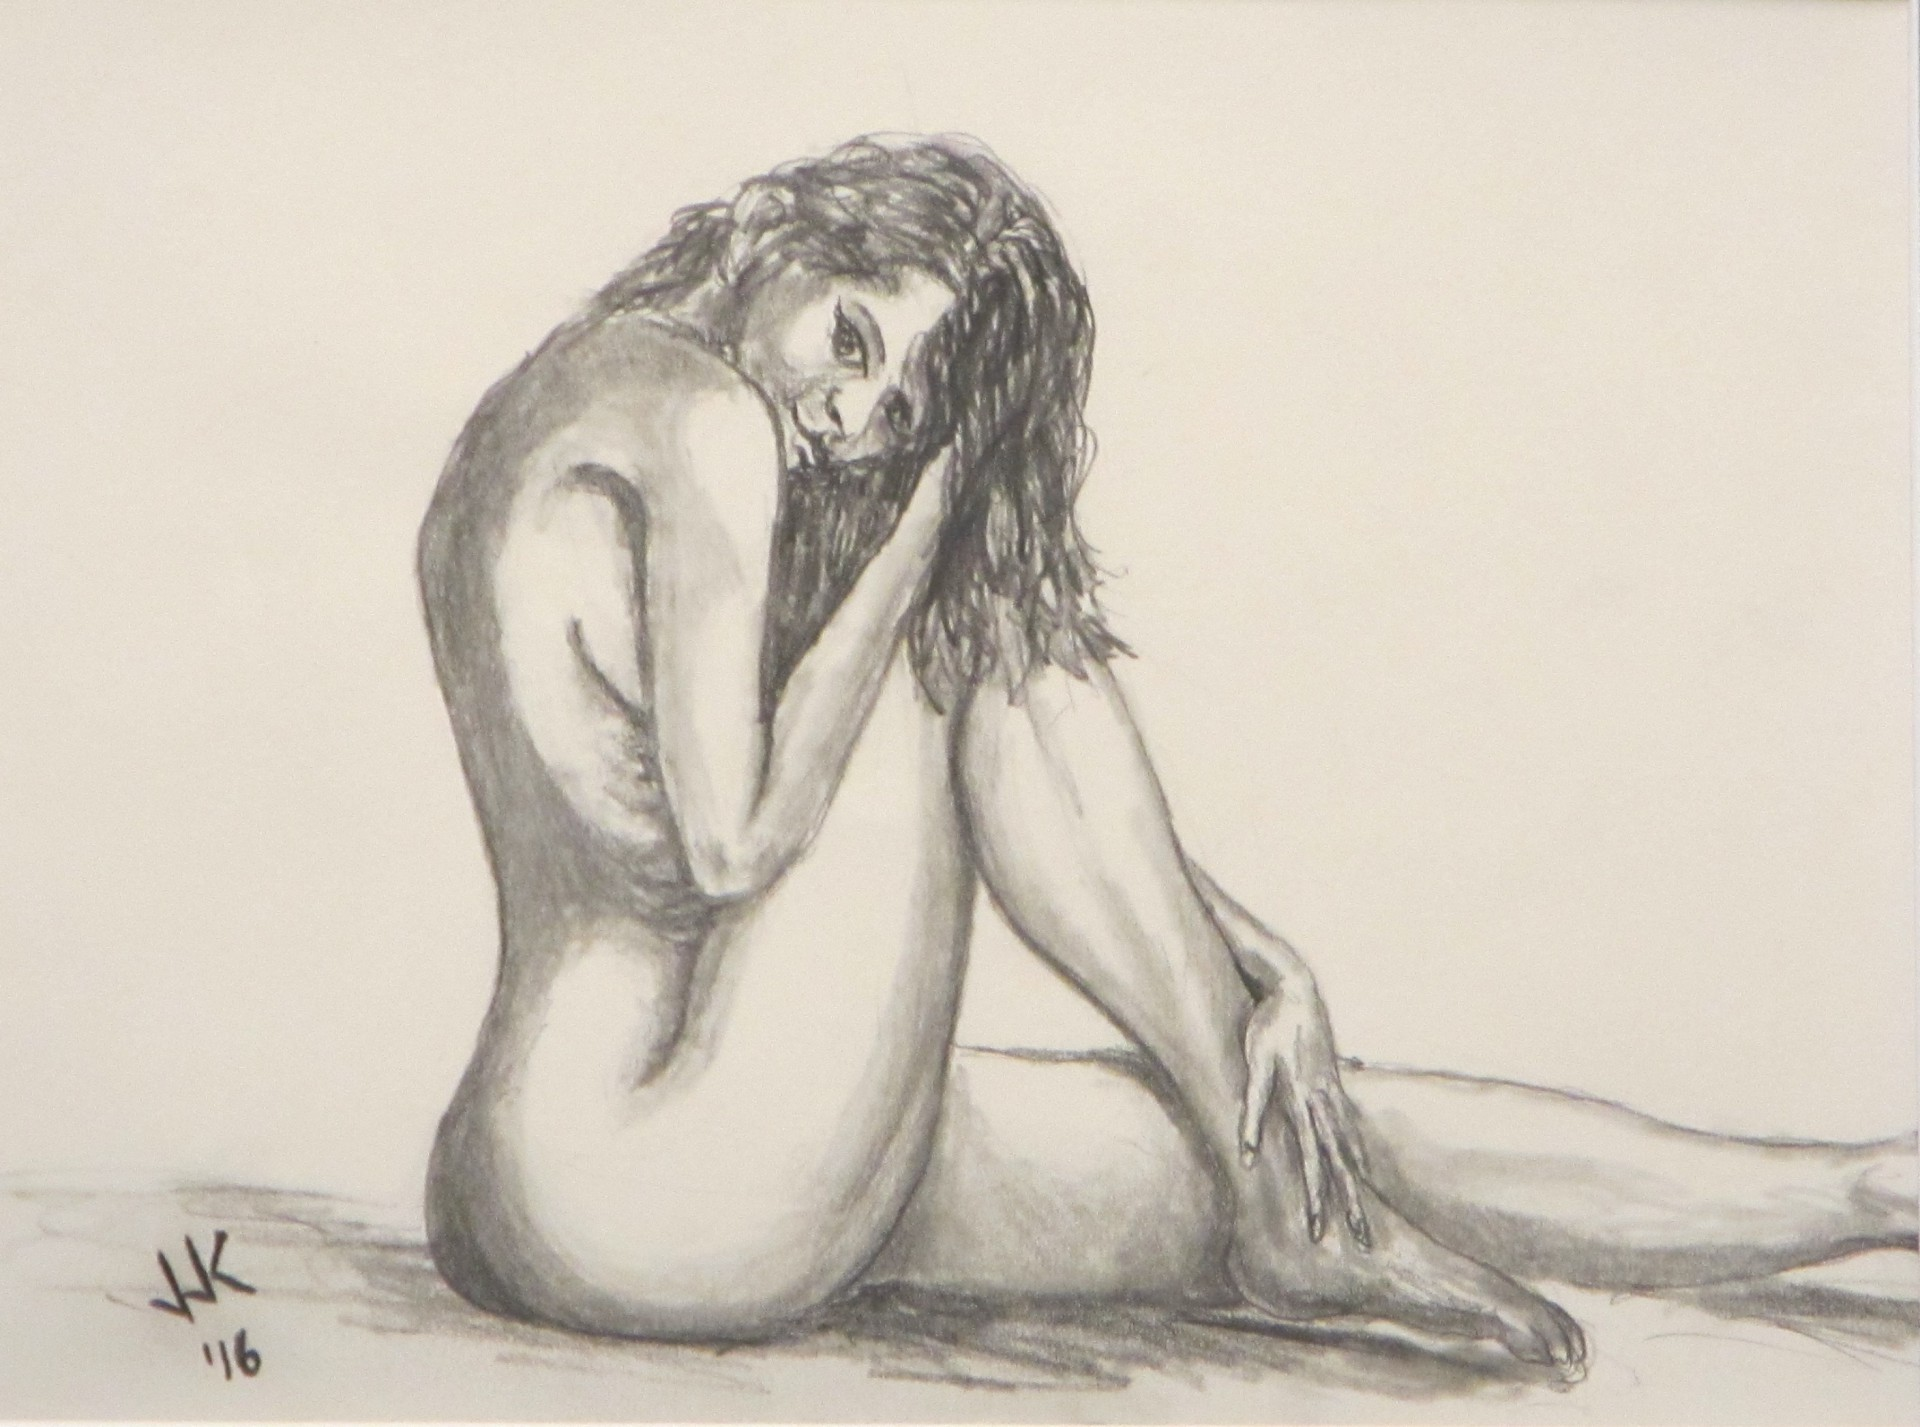 A nude, coquettish woman.